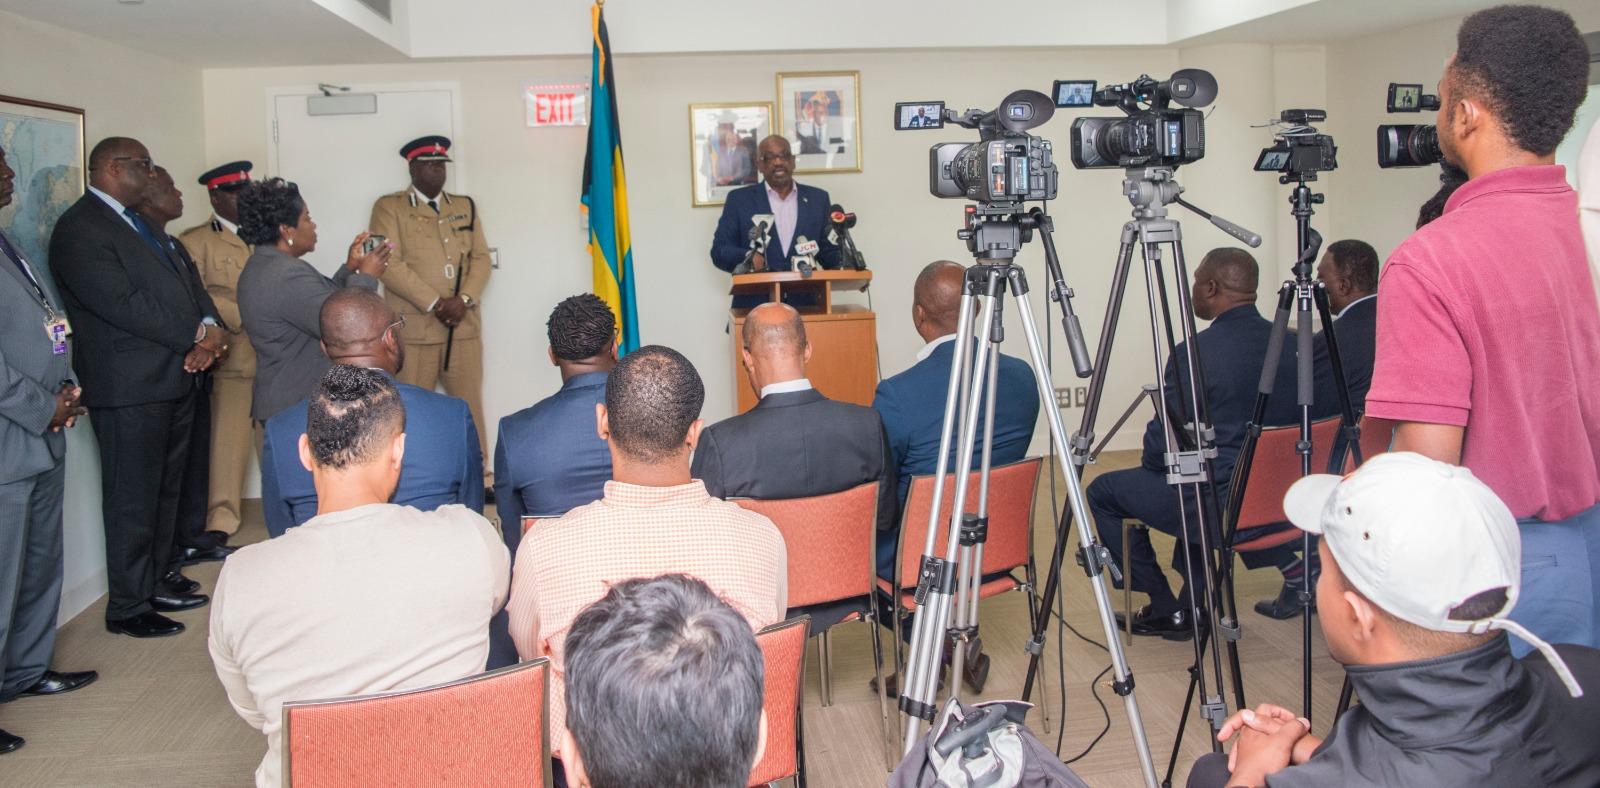 Bahamas to take part in CARICOM mission to Haiti